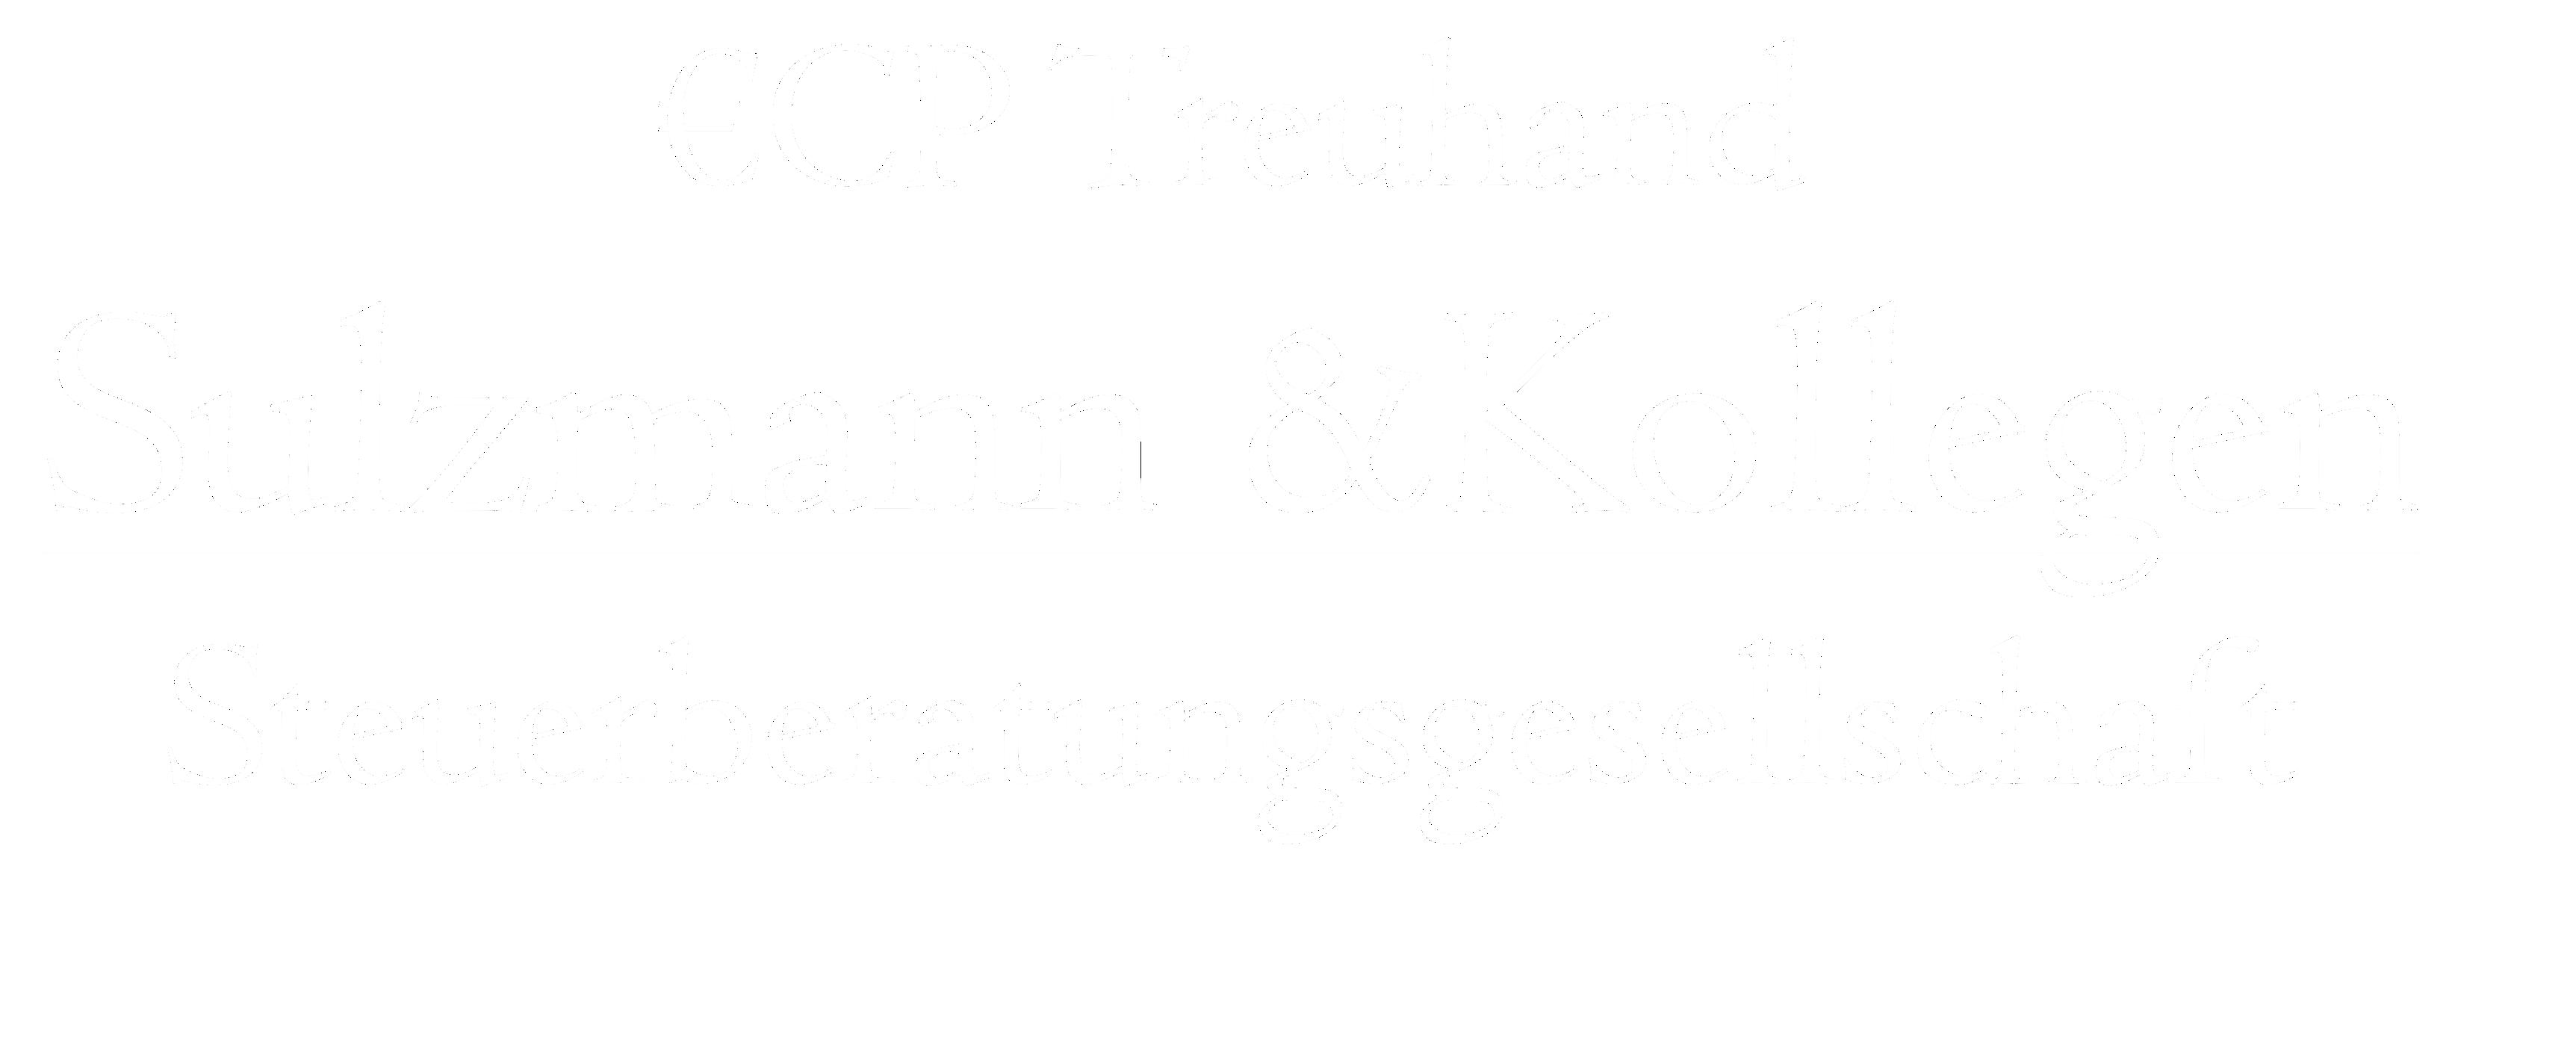 €CP - Treuhand